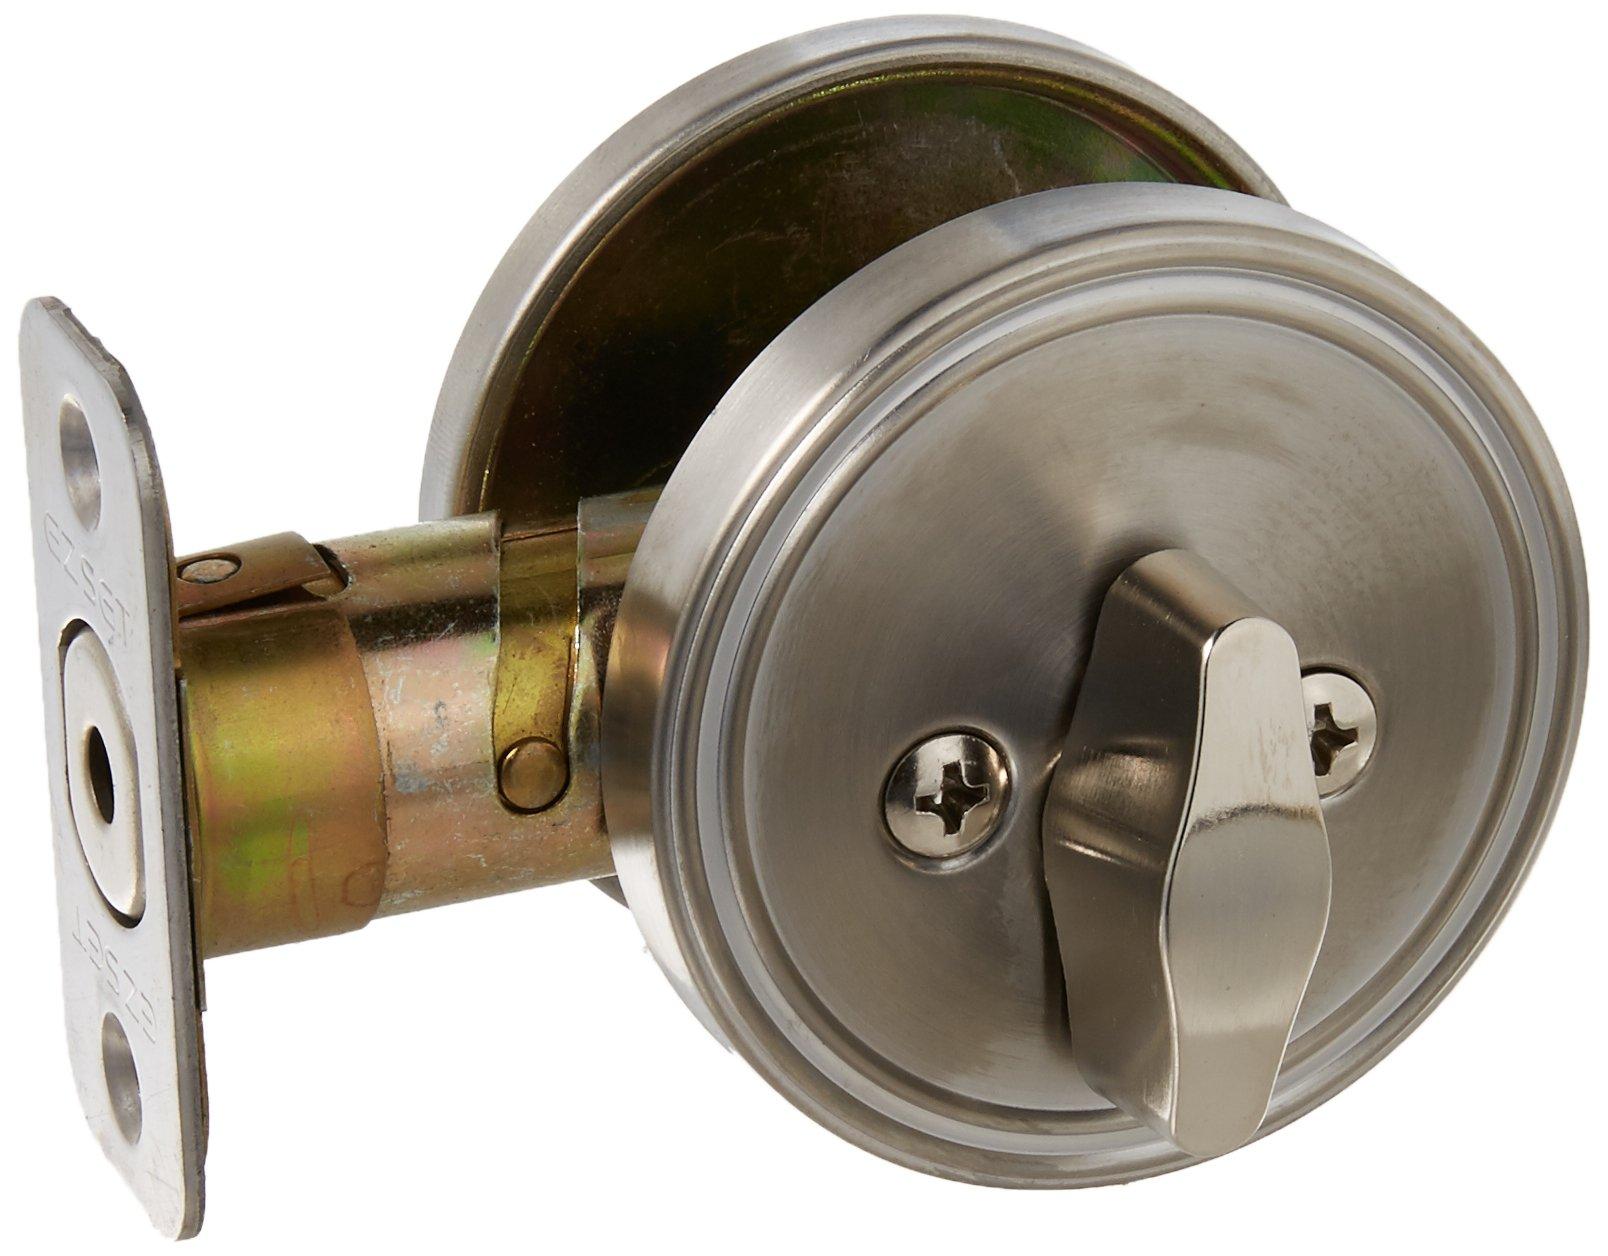 EZ-Set 231012 Double Cylinder Deadbolt by EZ-Set, Stainless Steel